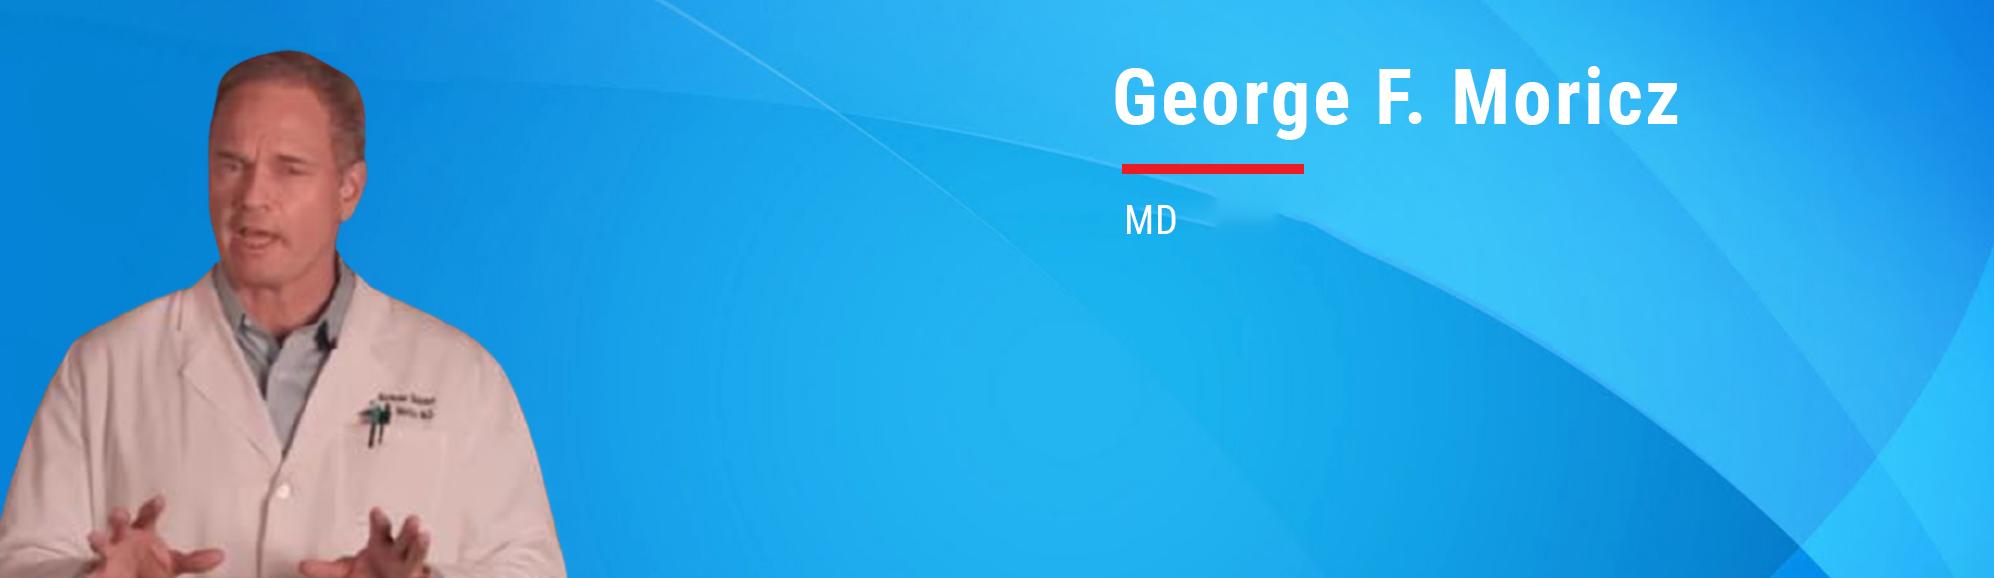 George F. Moricz, MD